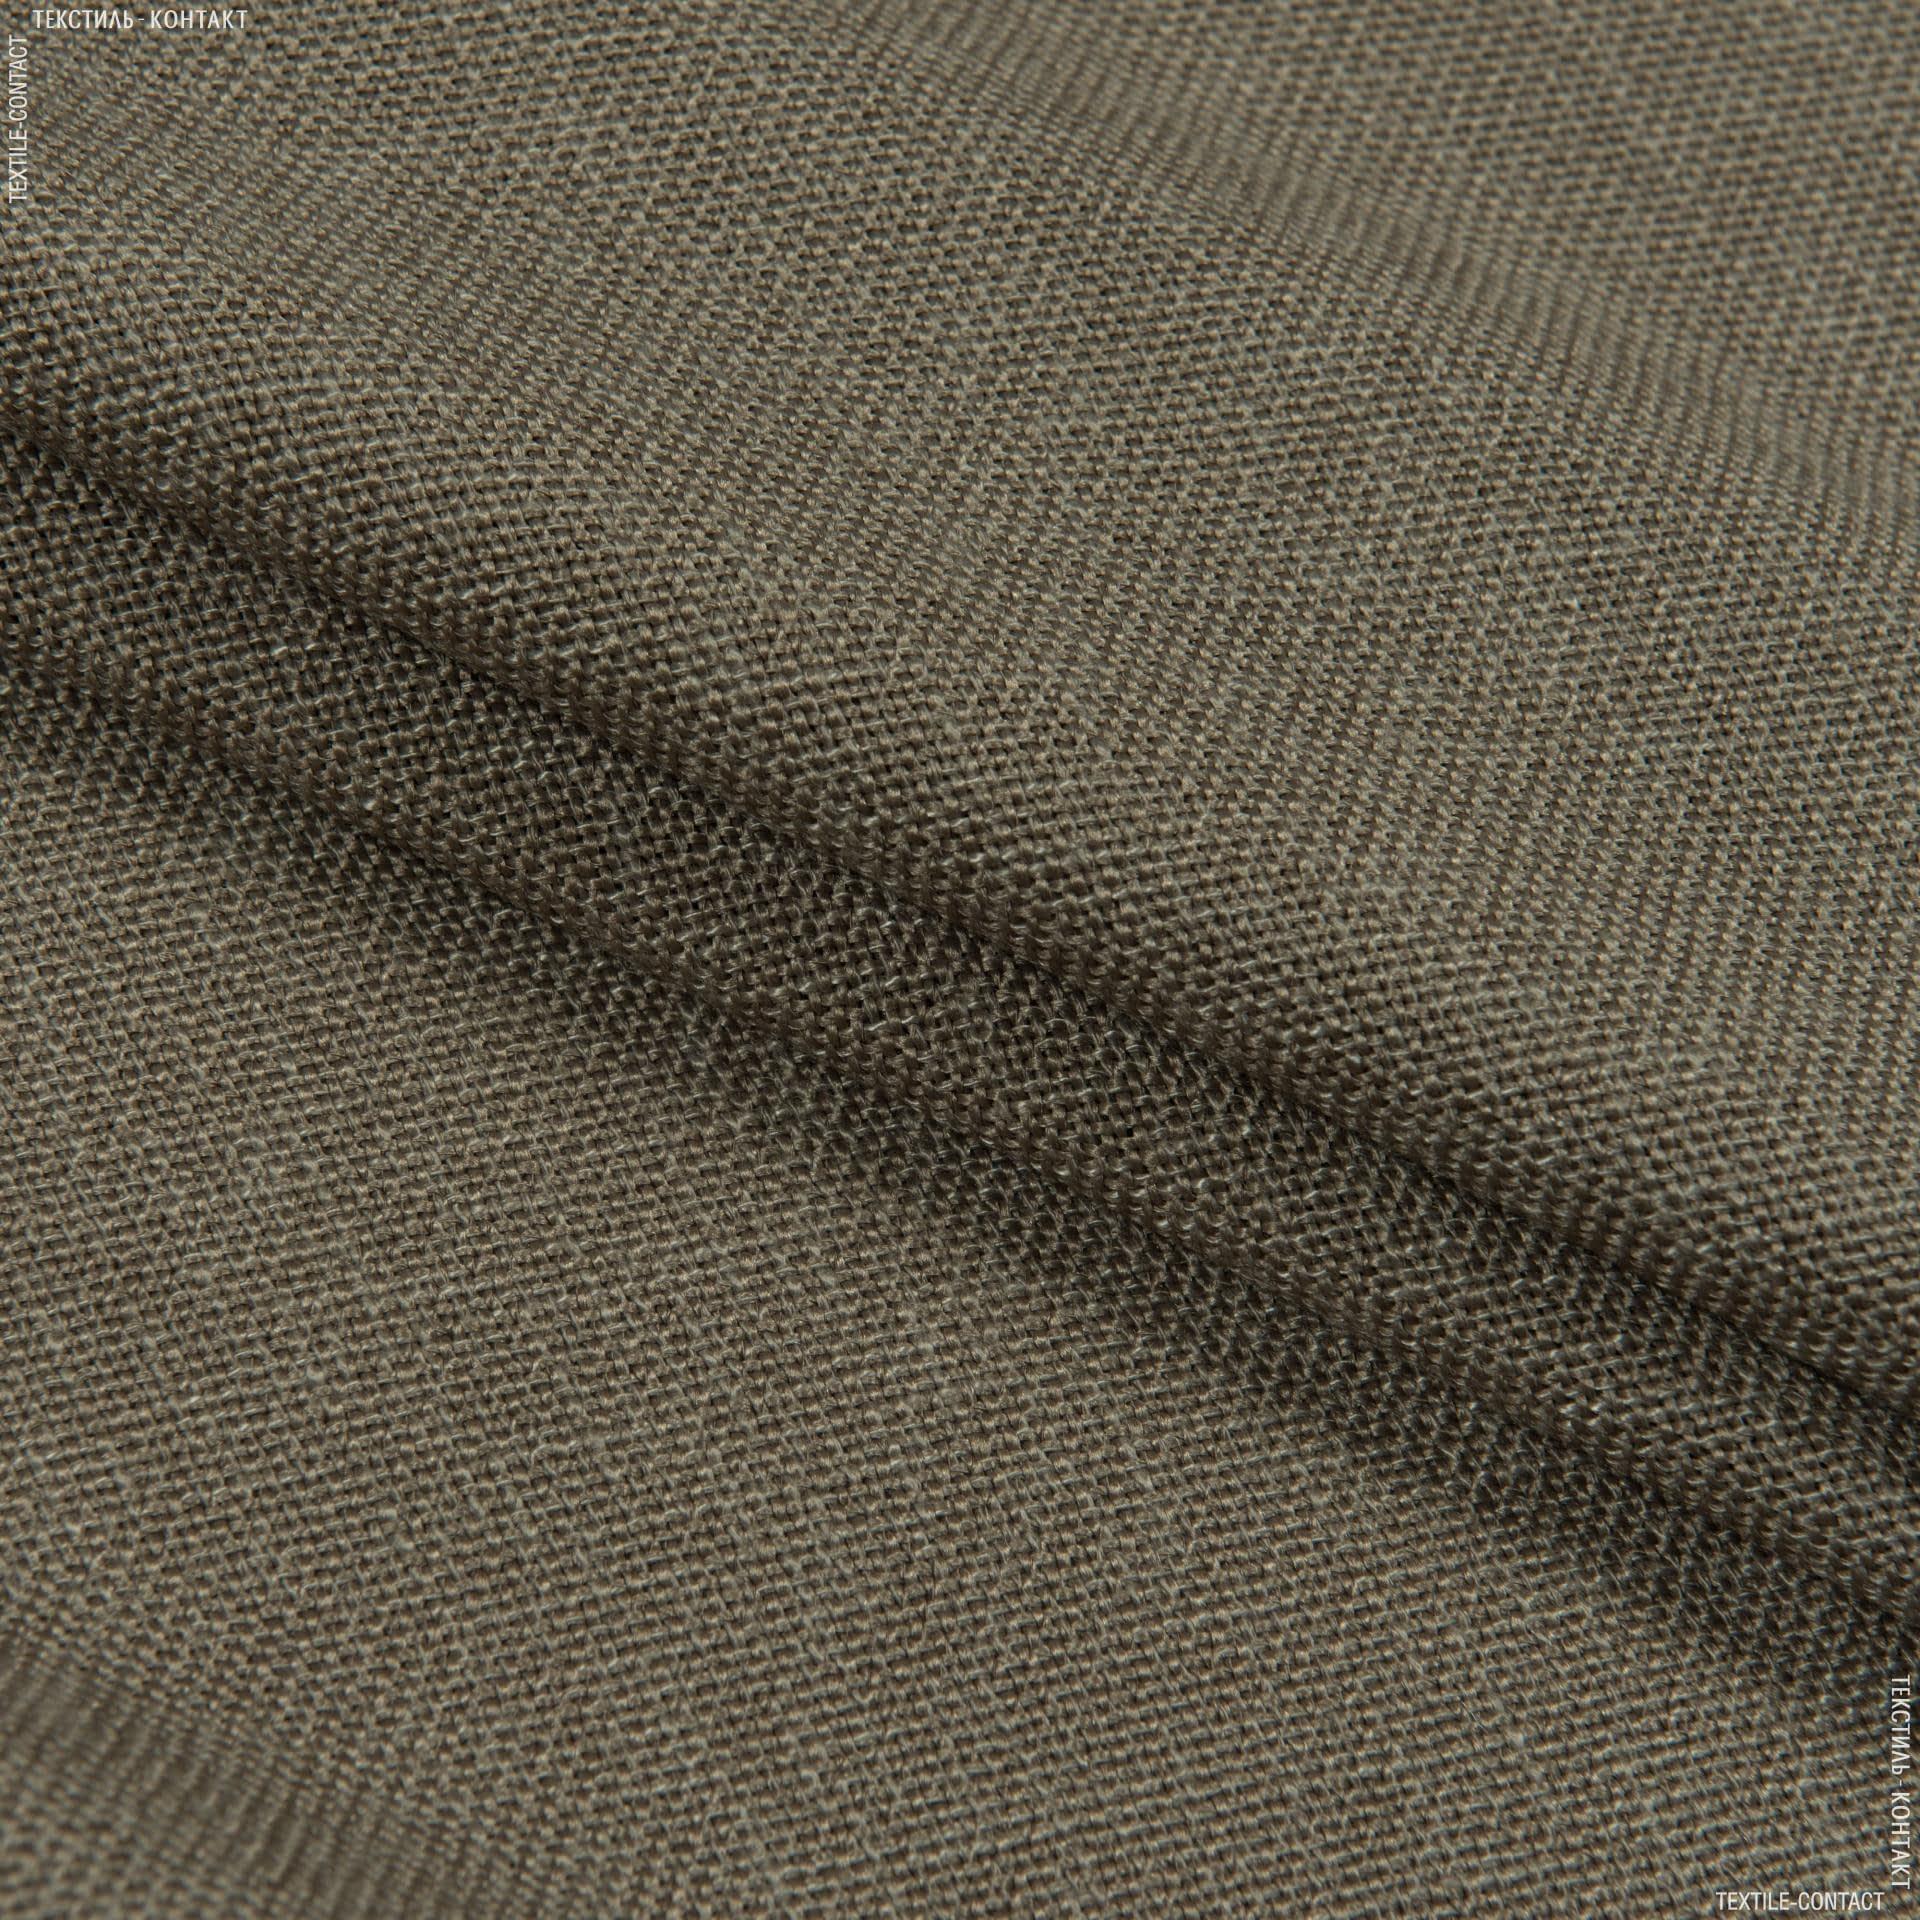 Тканини horeca - Декоративна тканина шархан /св.коричневий